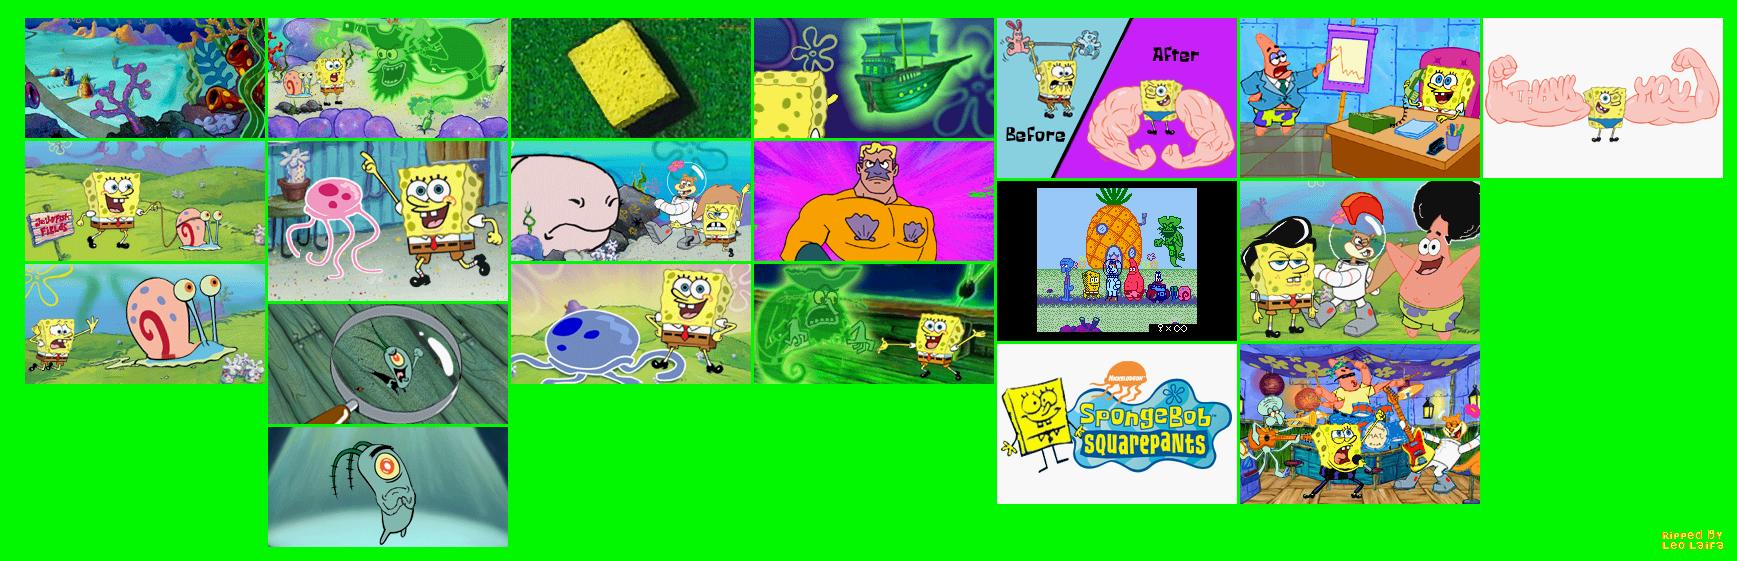 game boy advance spongebob squarepants revenge of the flying